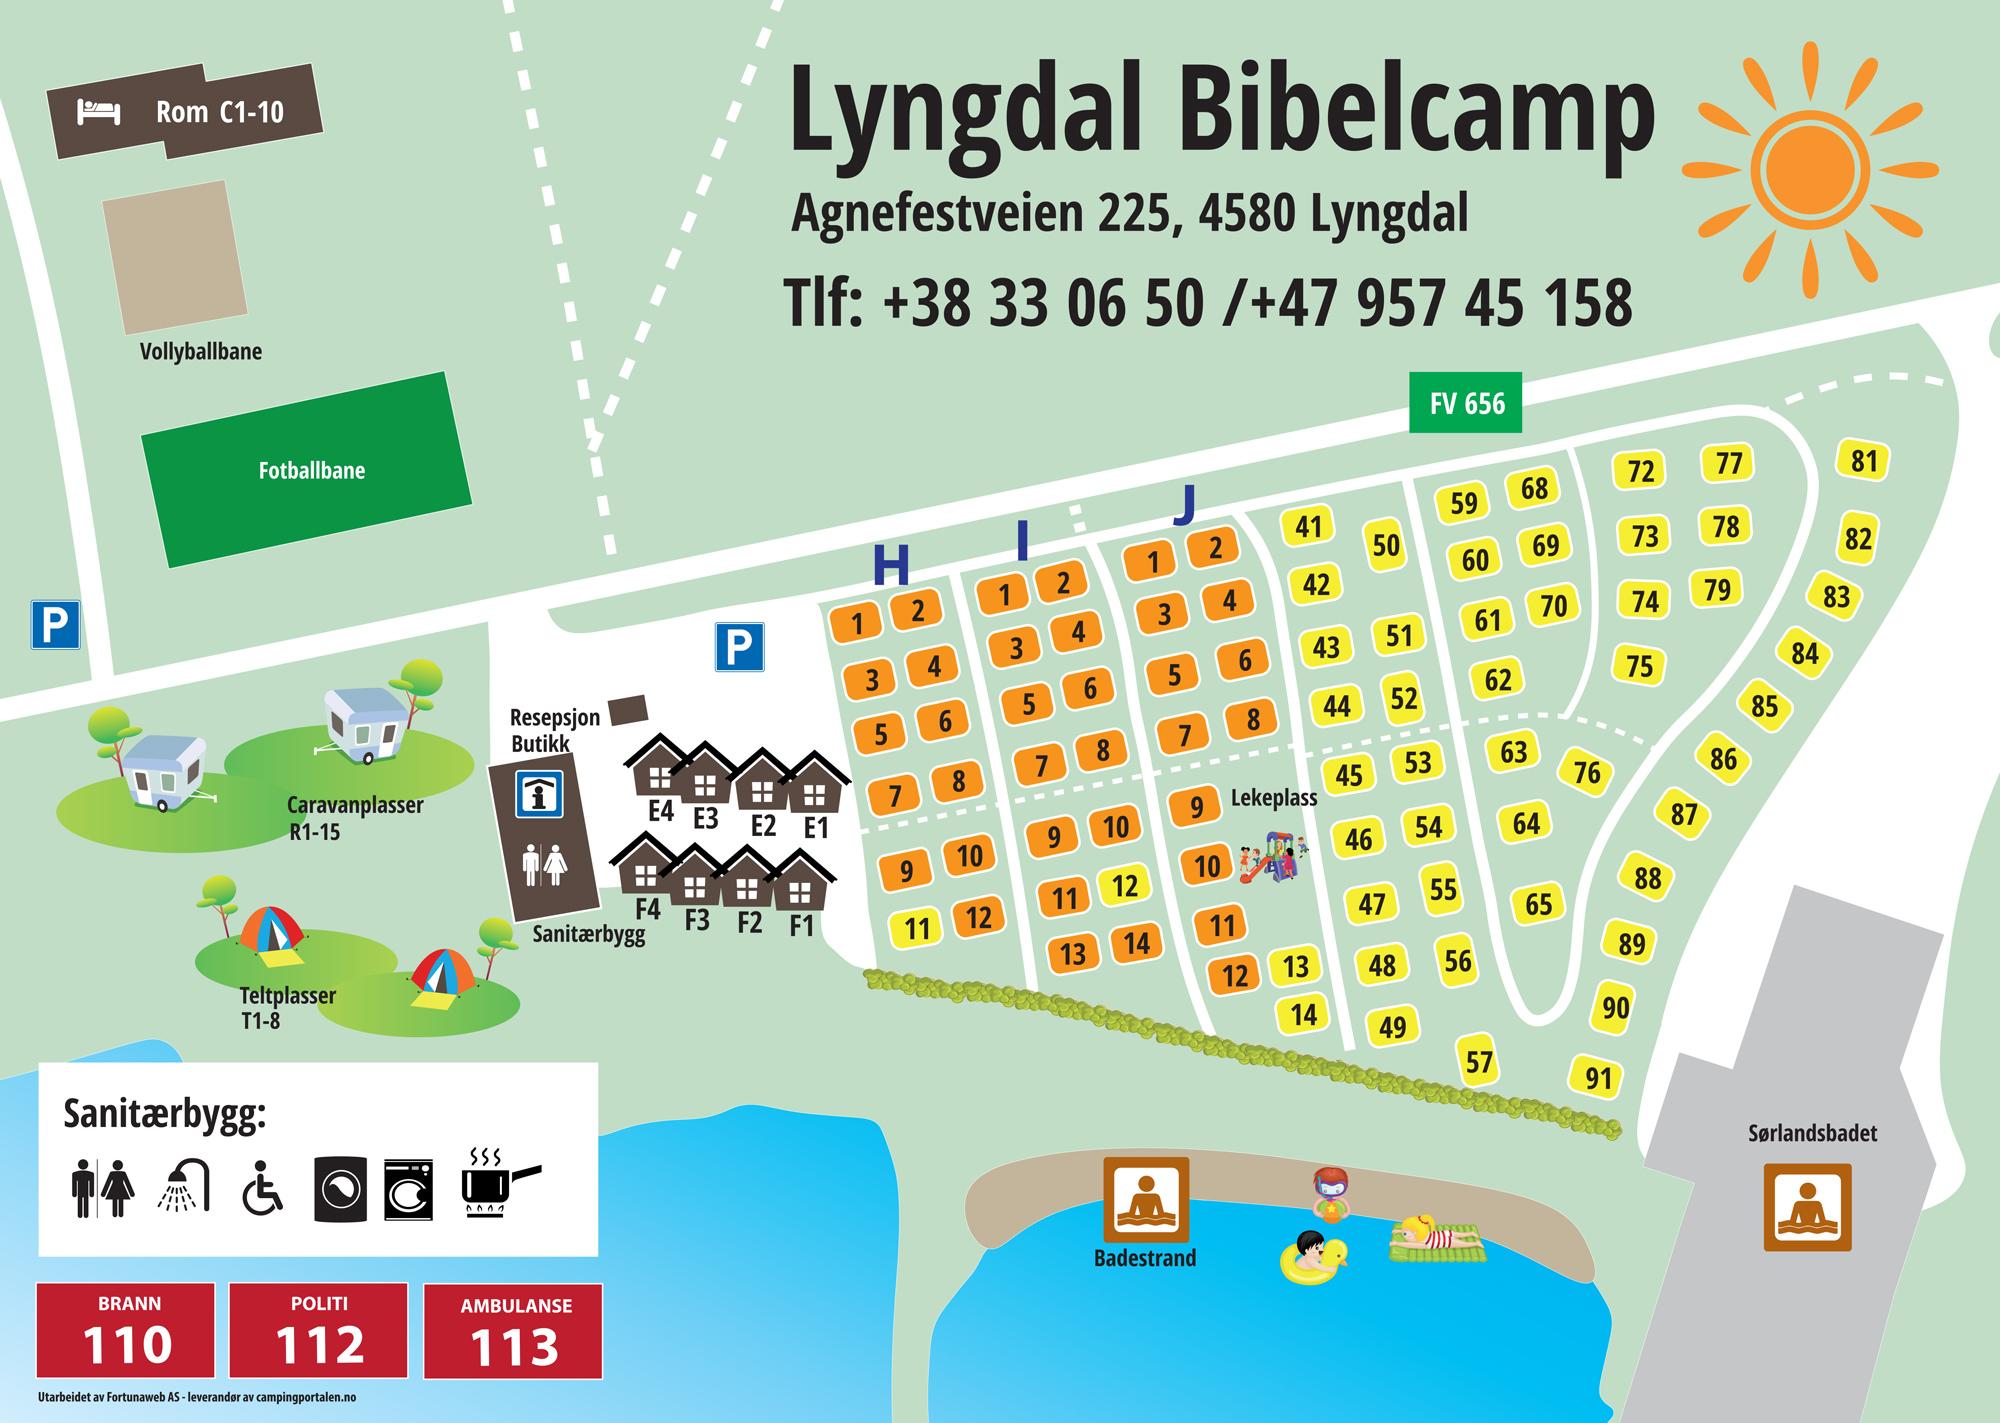 Der Campingplatz © Lyngdal Bibelcamp